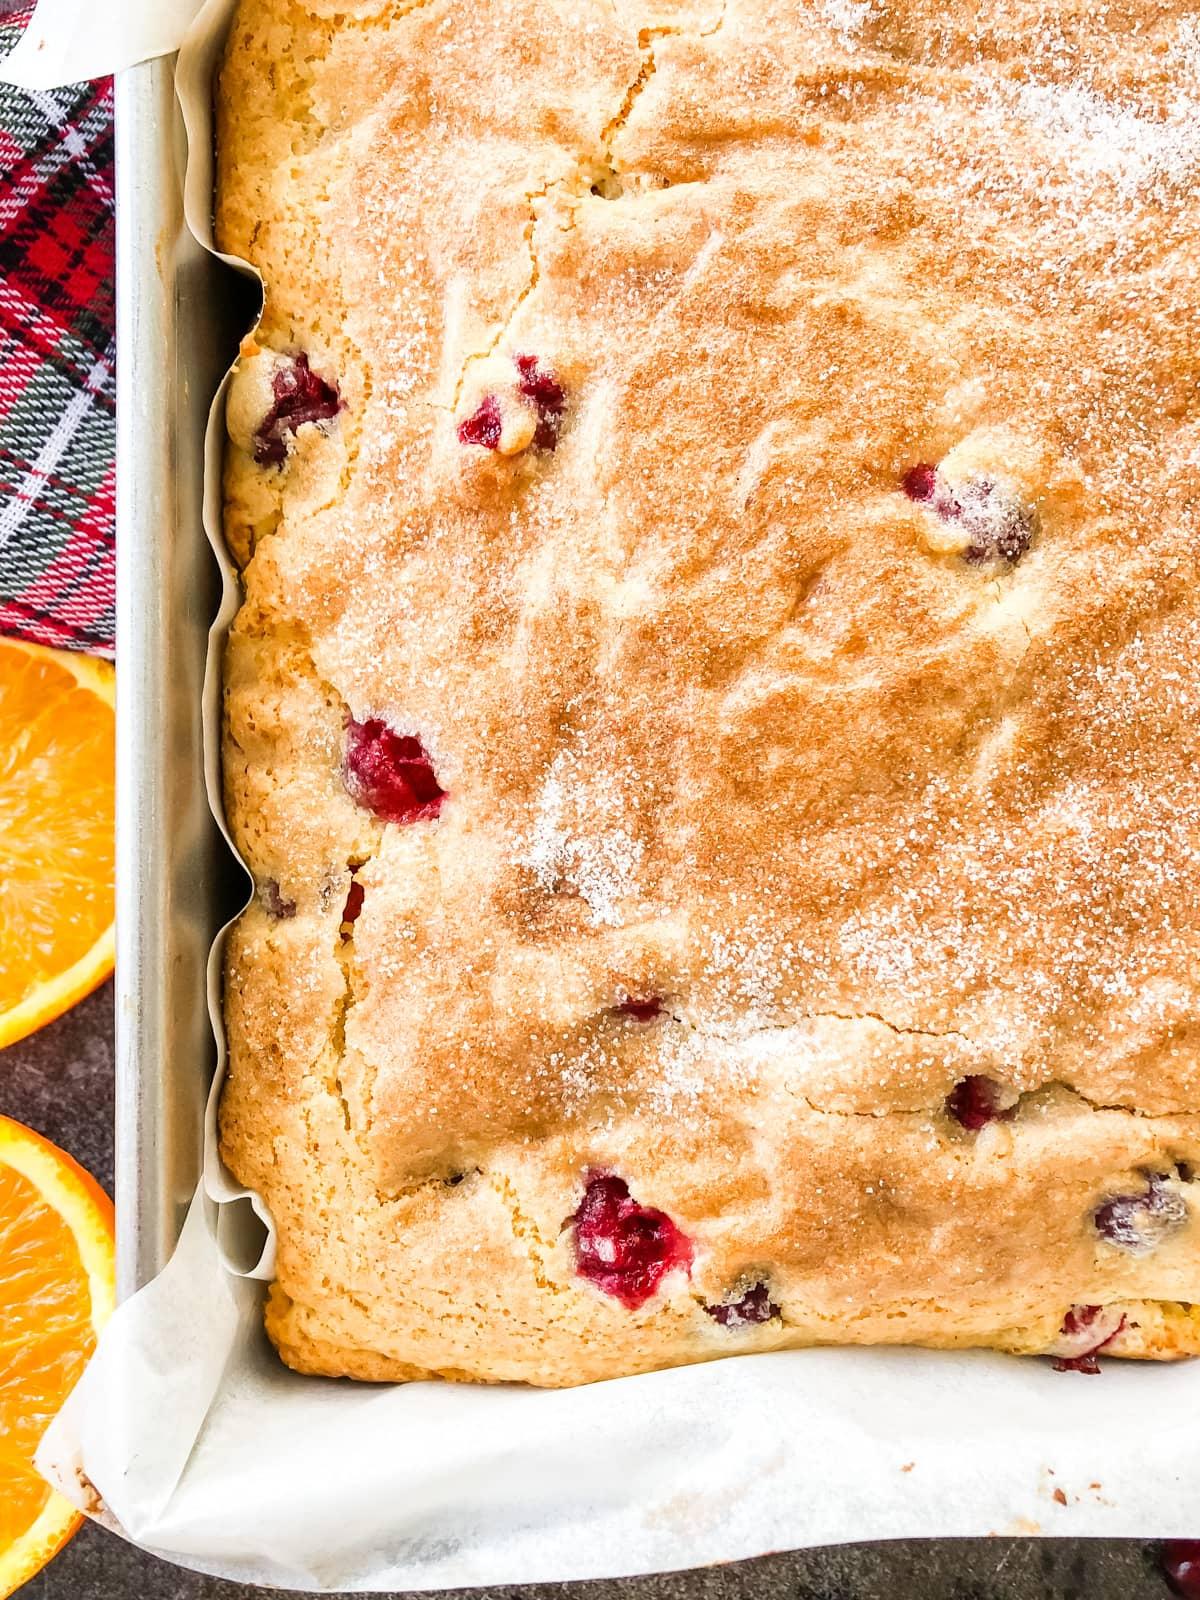 A close up of Cranberry Orange Breakfast Cake